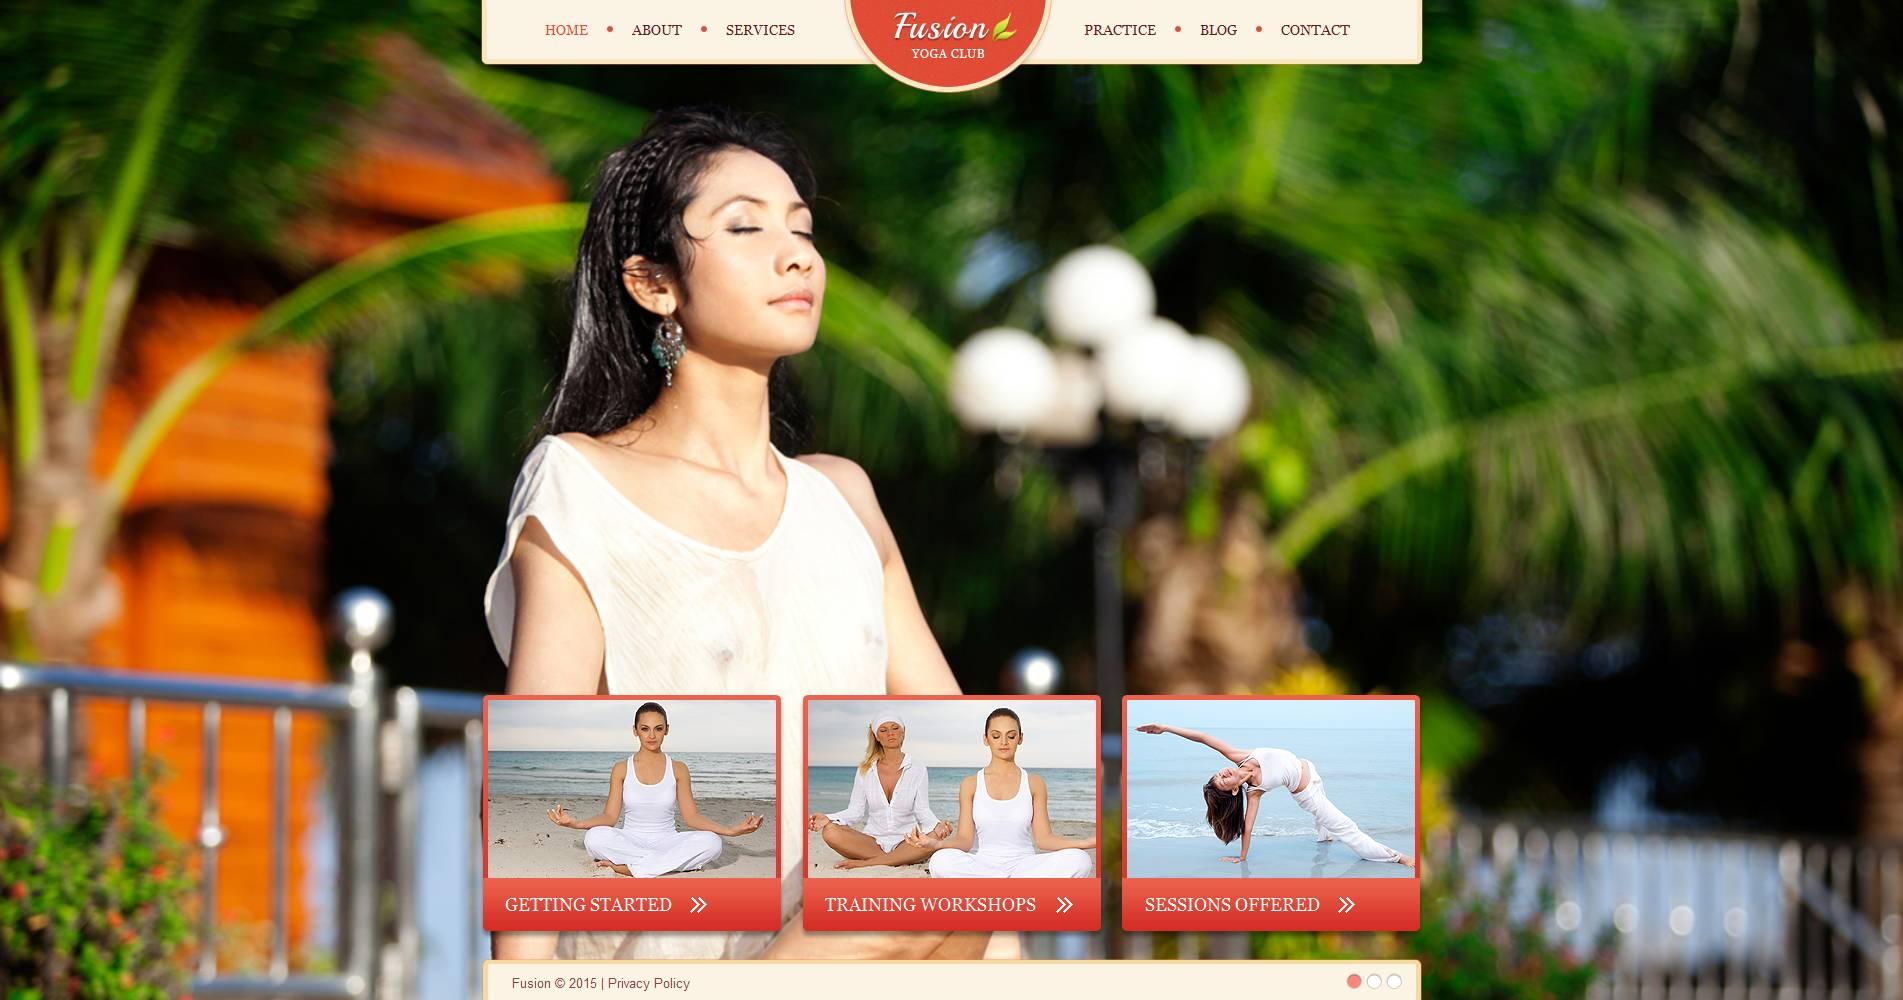 Premium Moto CMS HTML Template over Yoga №53509 - screenshot